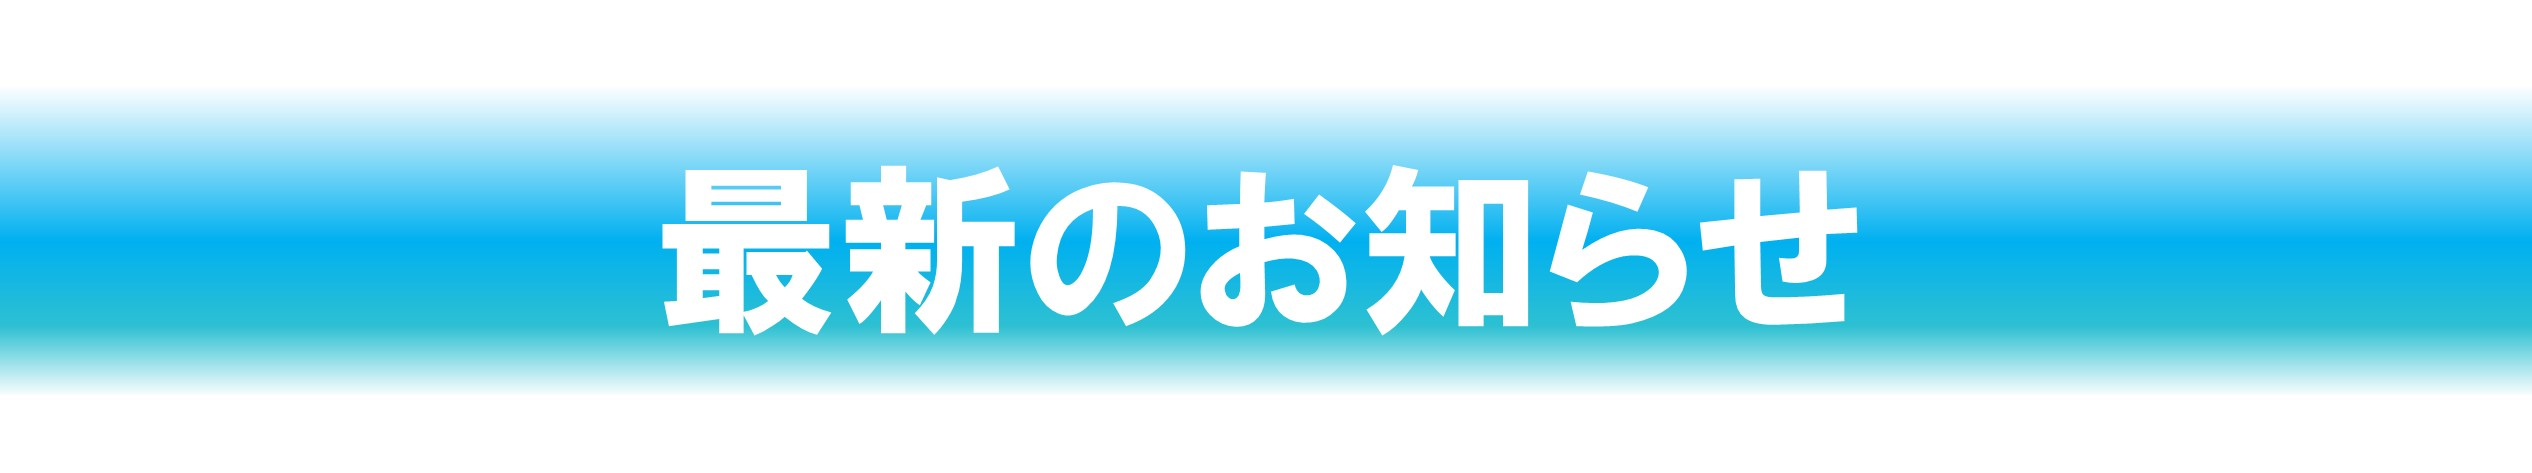 HPお知らせ用 - コピー